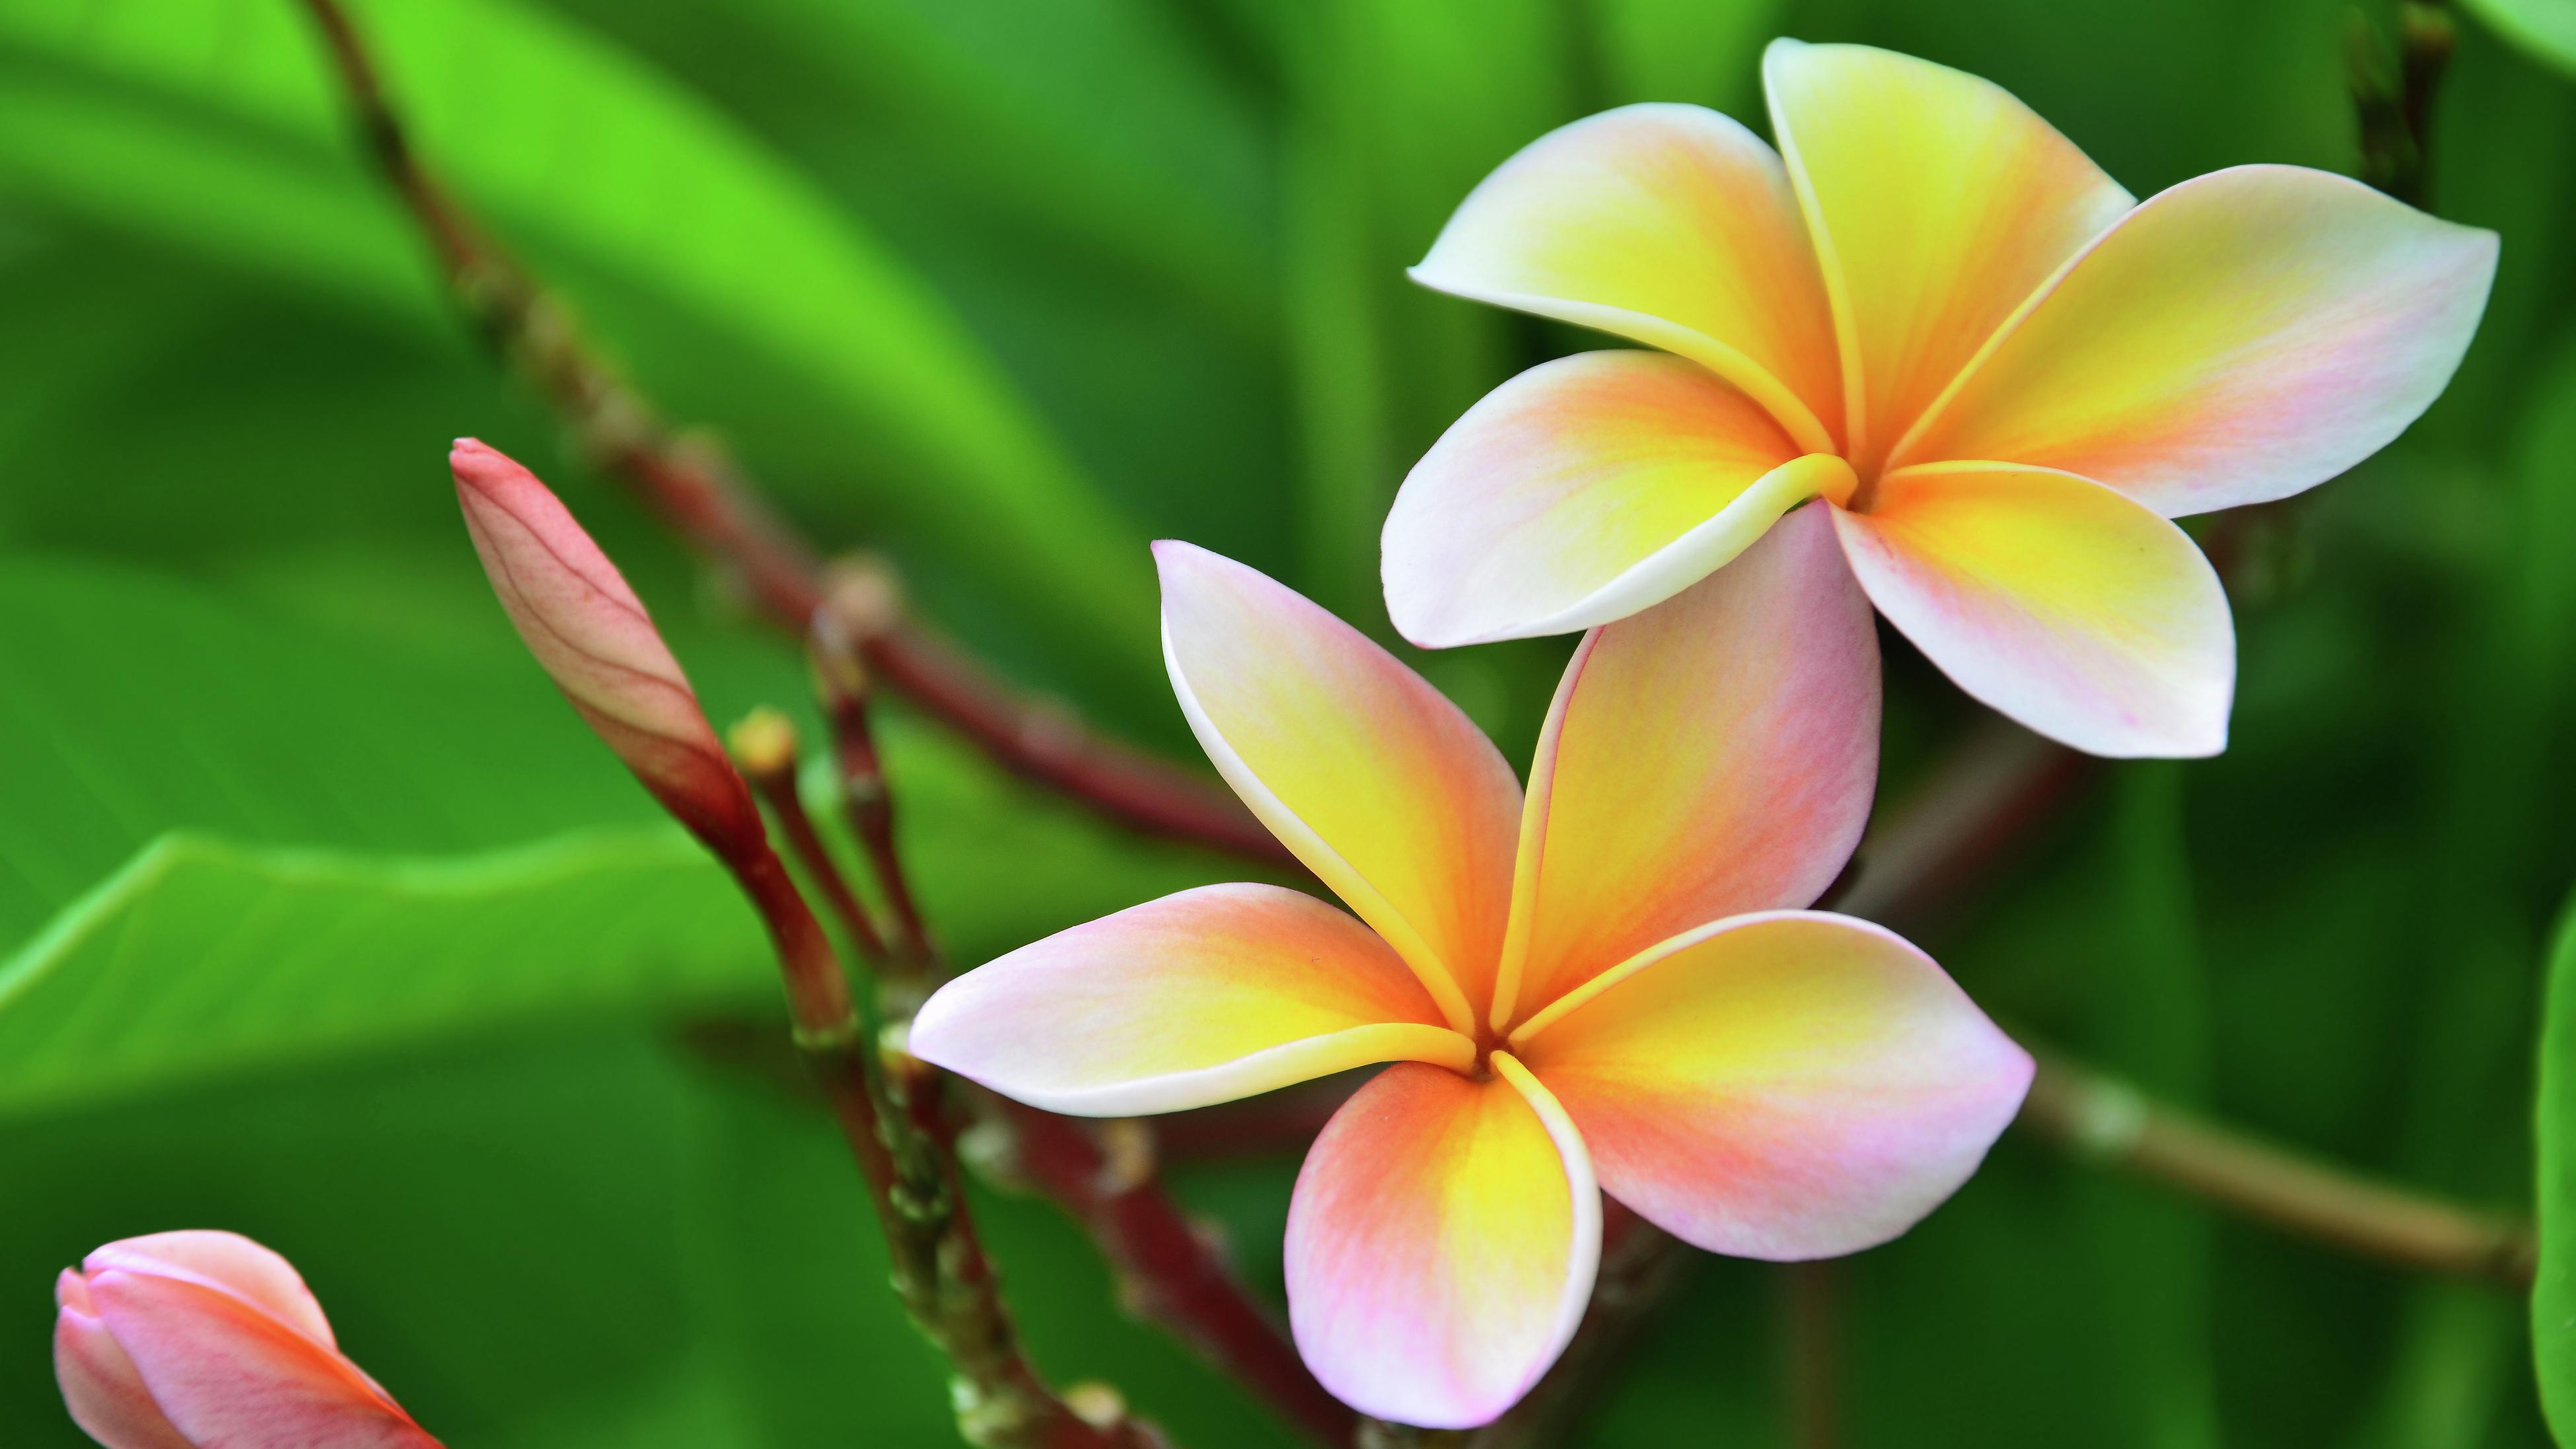 Yellow, pink and white frangipani flowers